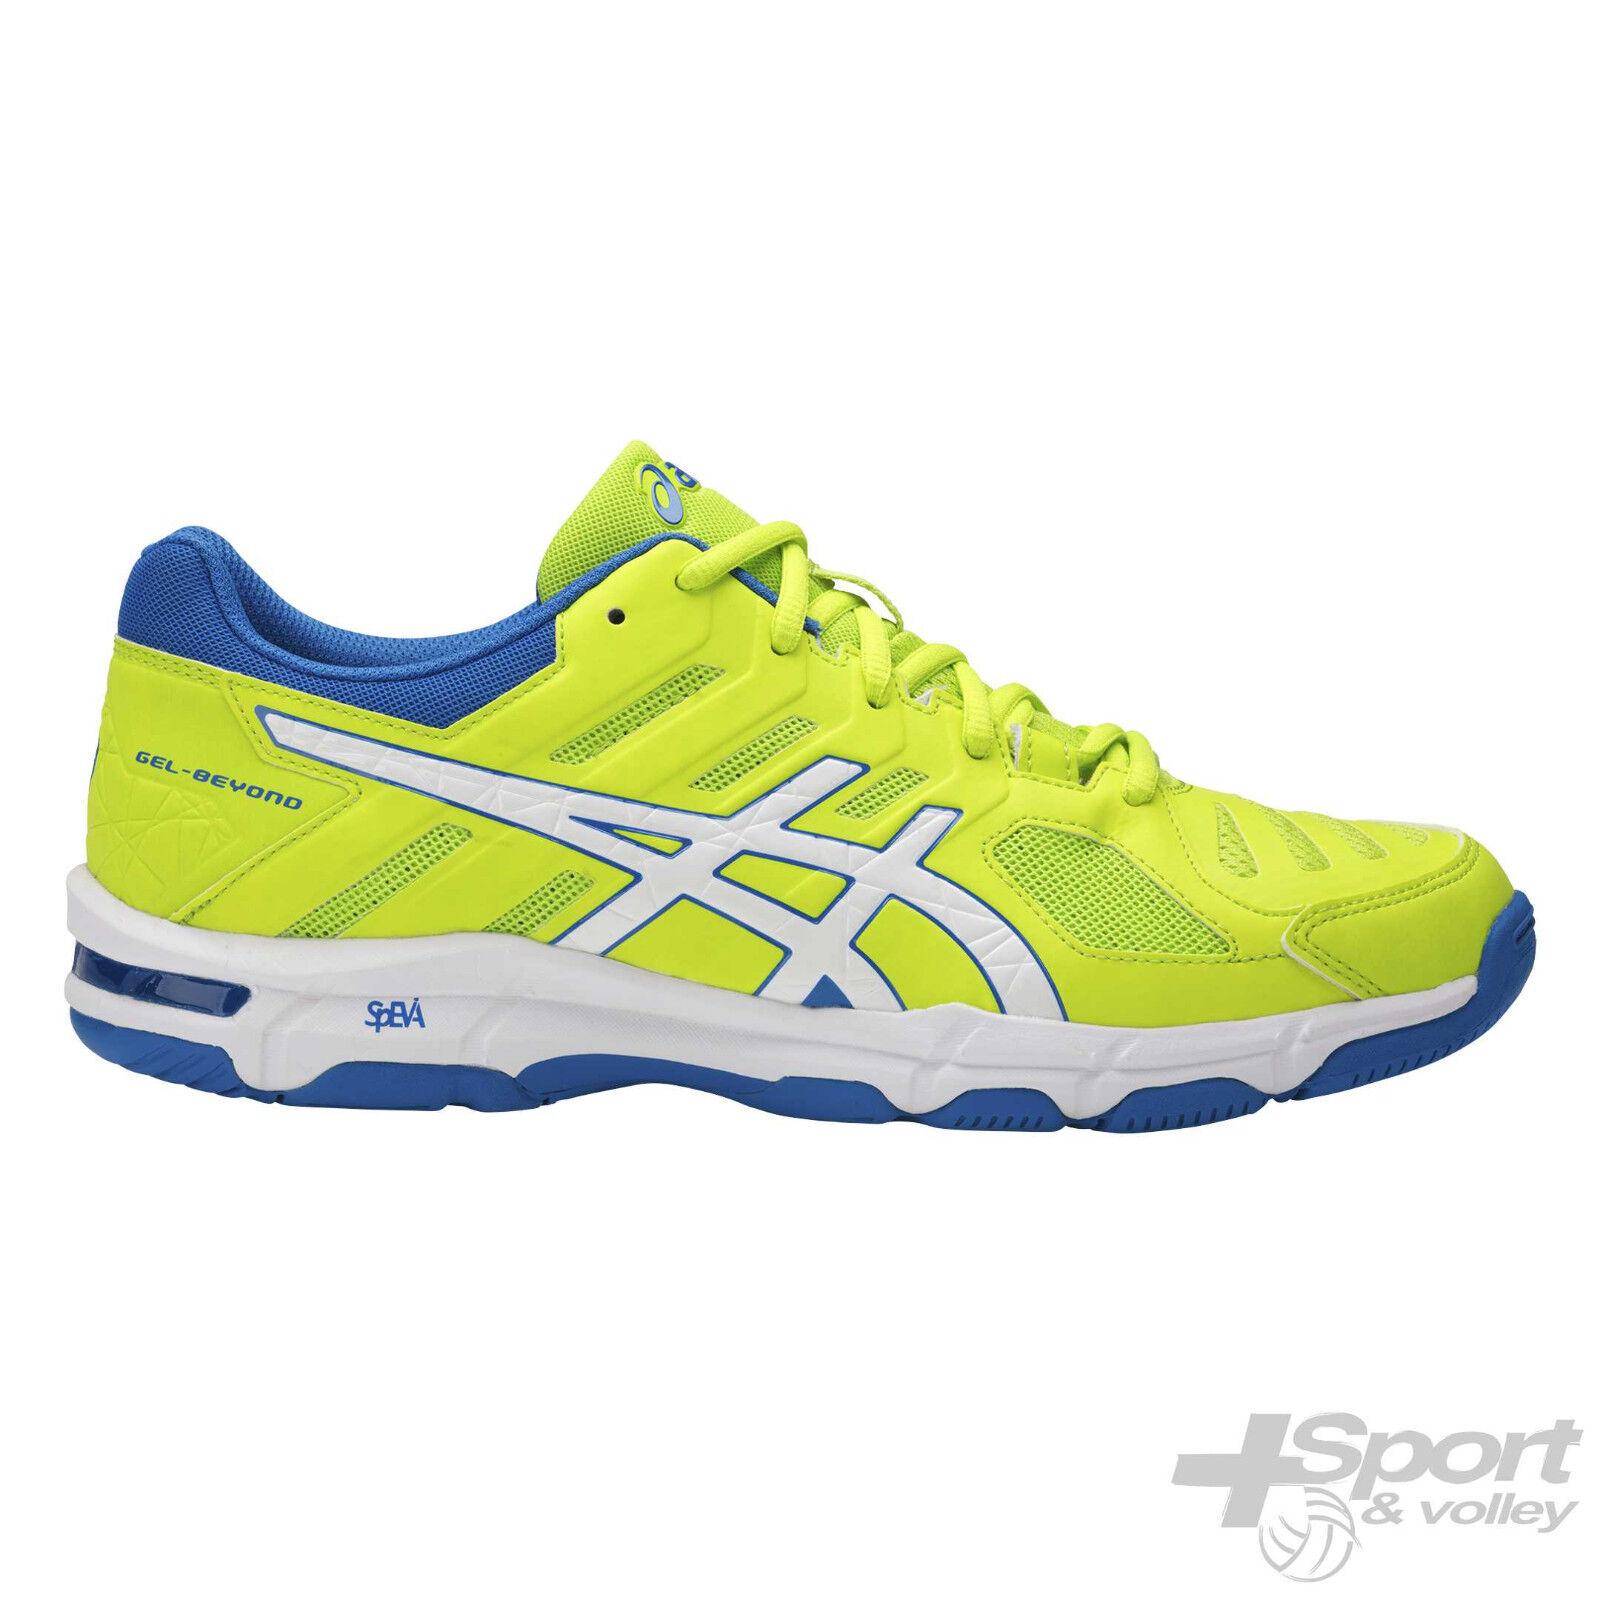 Chaussure volleyball Asics Gel Beyond 5 Low Man B601N 7701